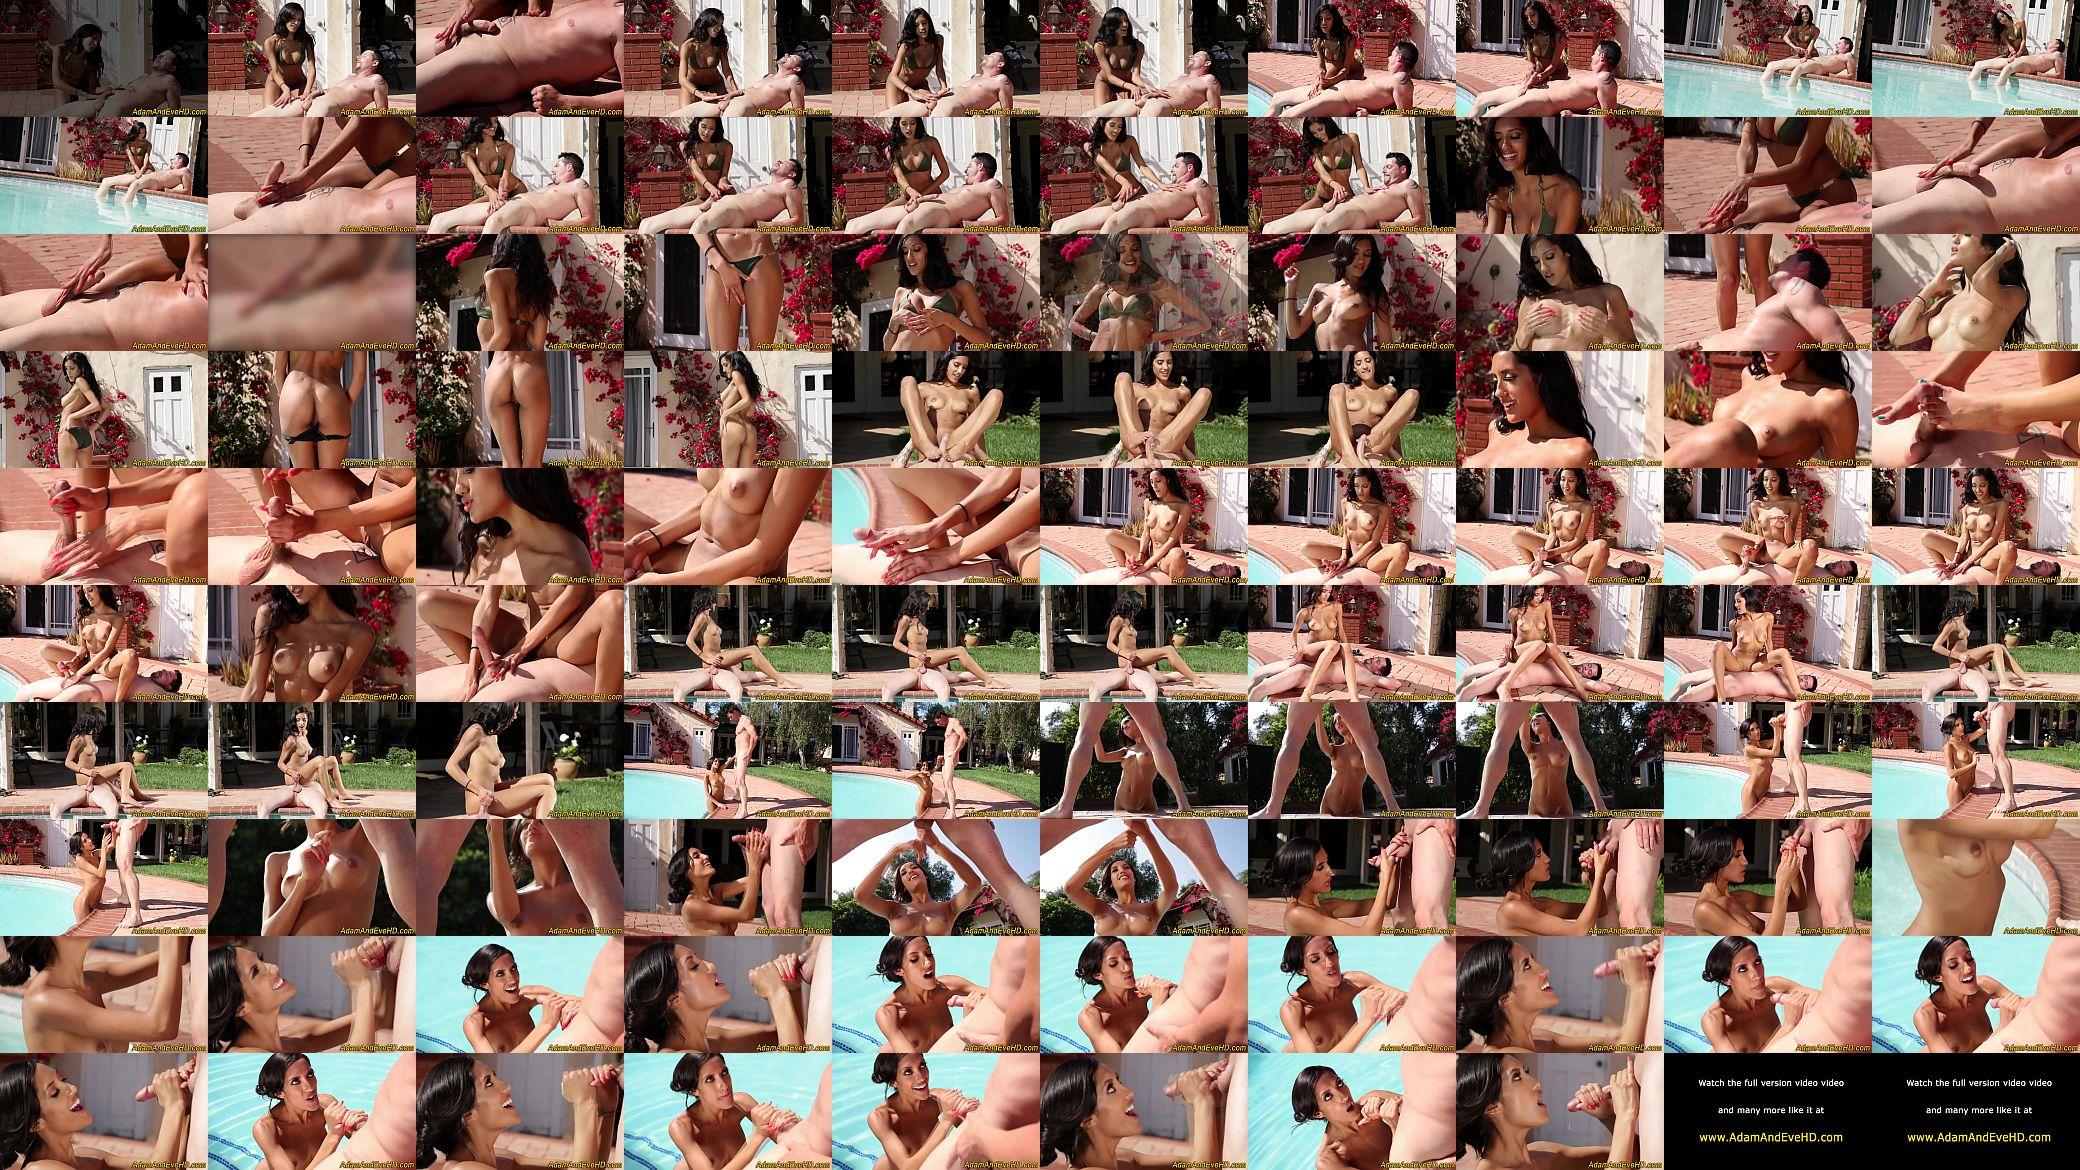 Adam And Eve Sex Pics adam-and-eve (17) - xnxx